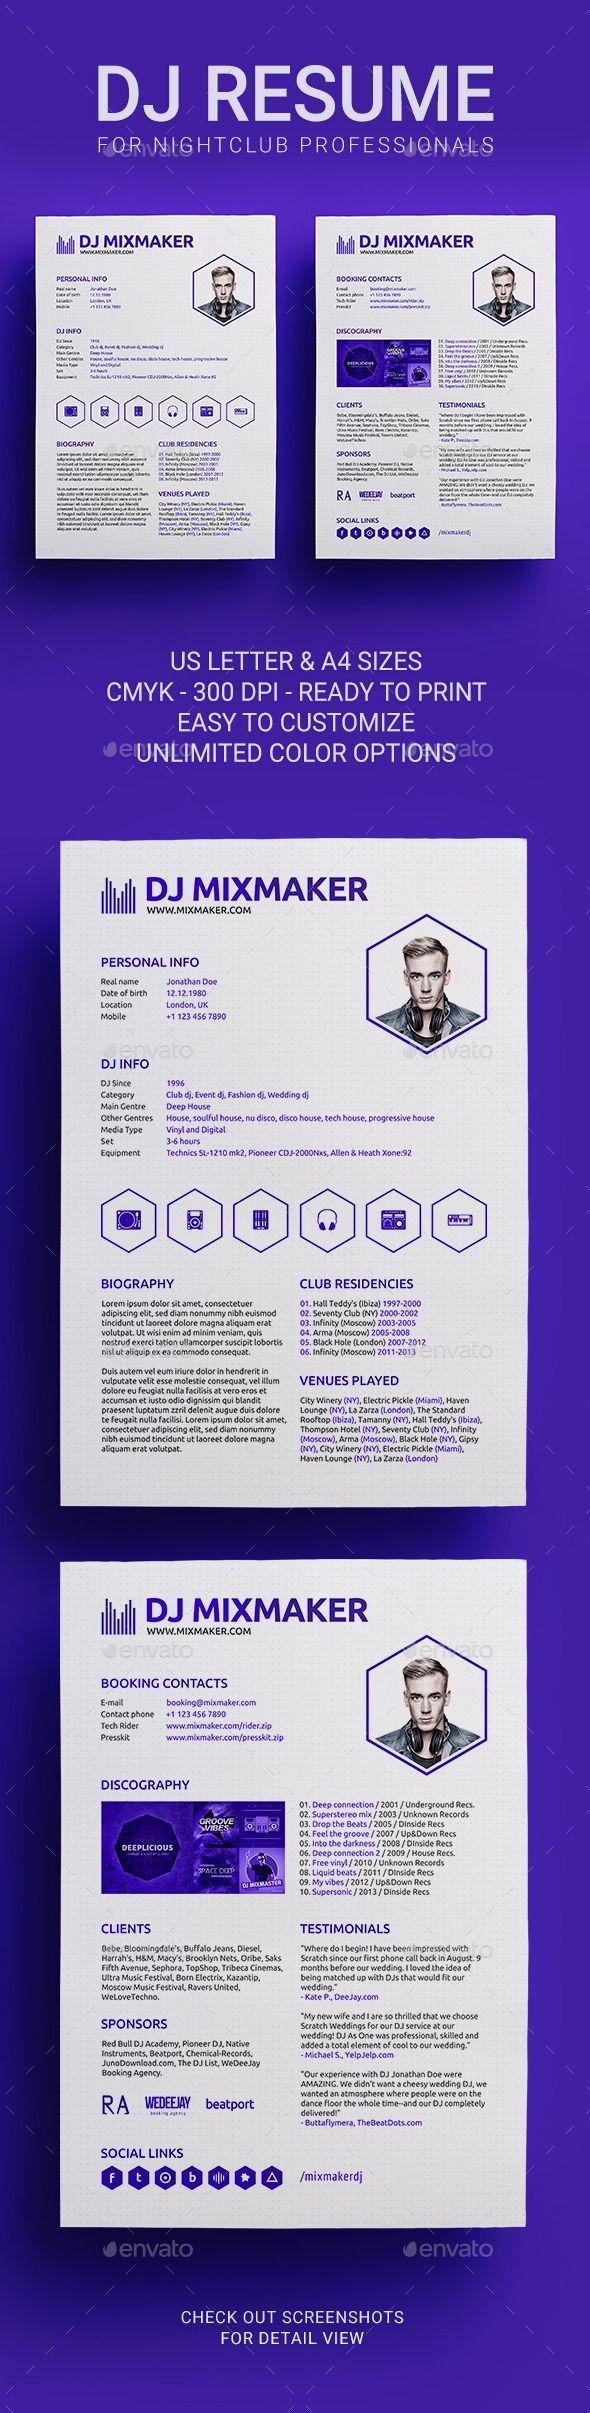 best images about dj press kit and dj resume templates on mixmaker dj resume press kit psd template